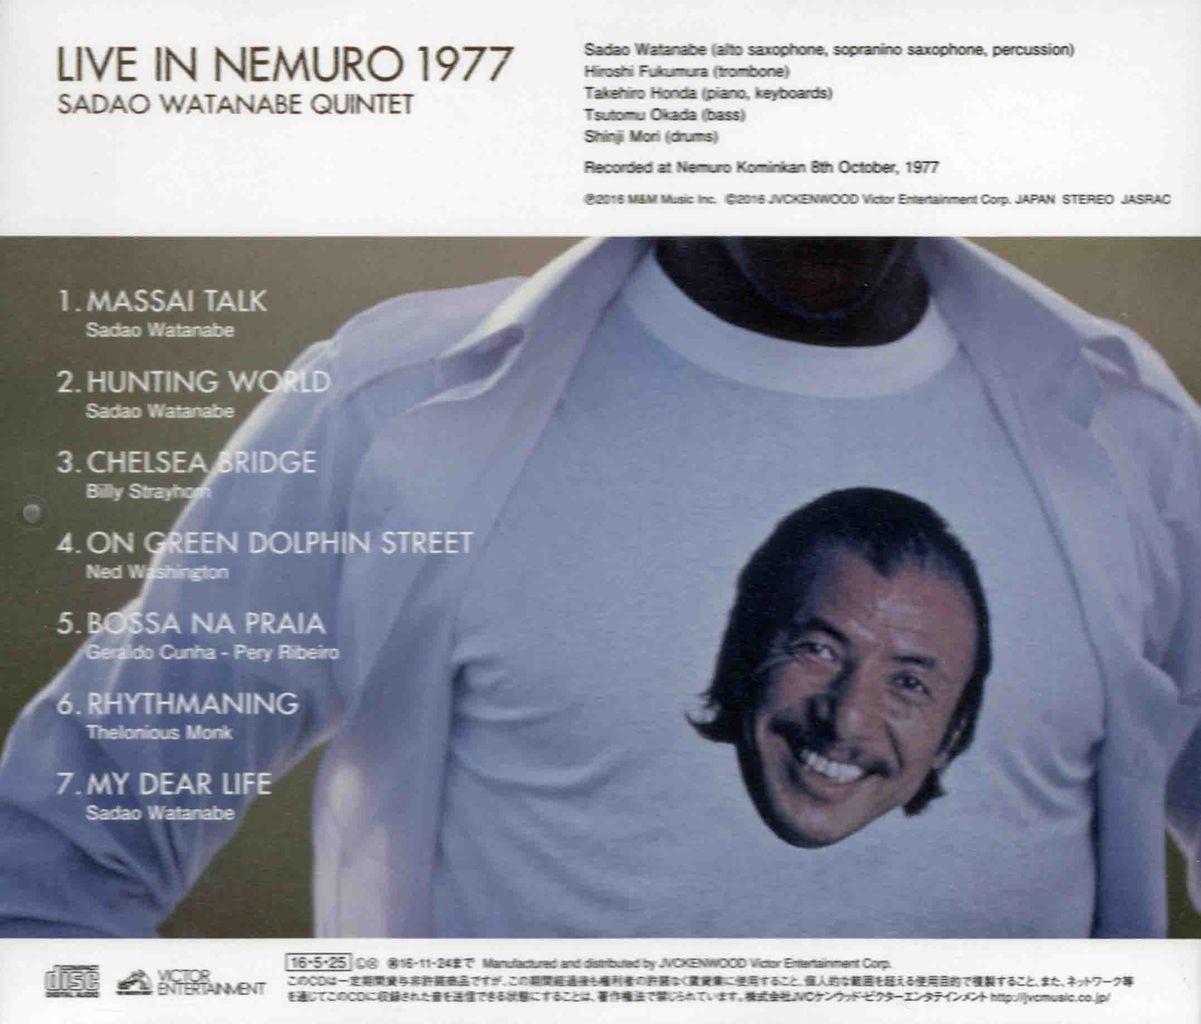 LIVE IN NEMURO 1977-2